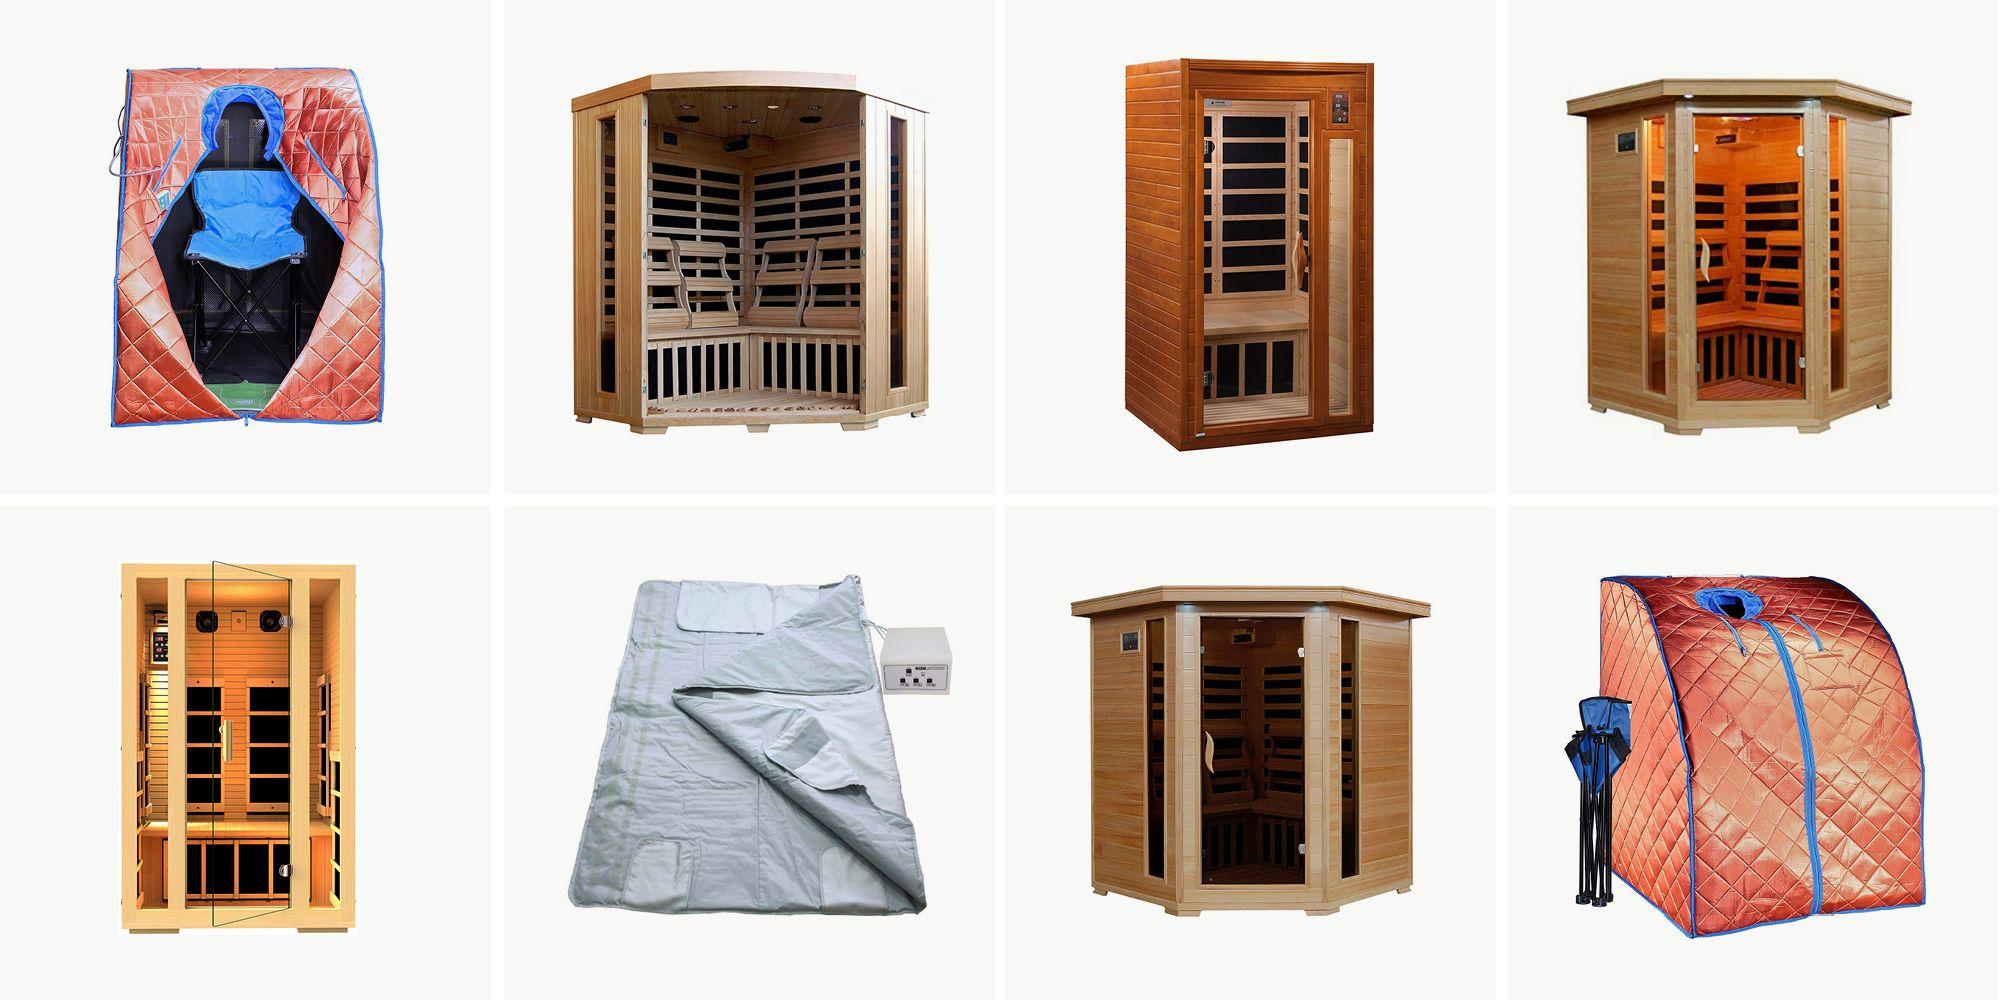 Home Sauna Kits Since 1974 best home saunas 2019 – benefits of a sauna